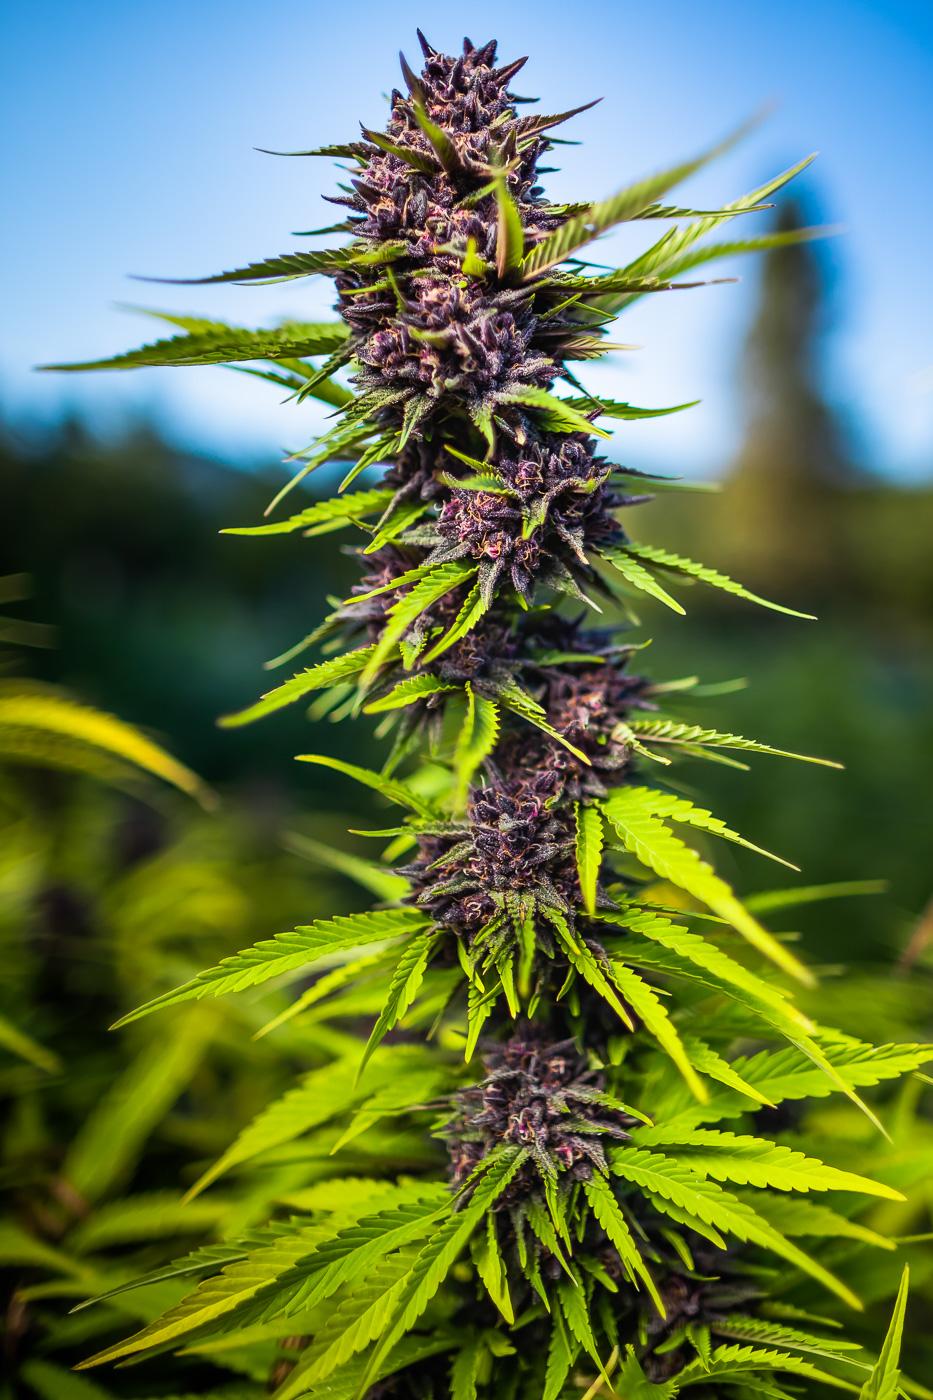 KAMIKAZE KISH - total CaNNABINOIDS - 18.2%THC - 15.29%TERPENES - 4.067%